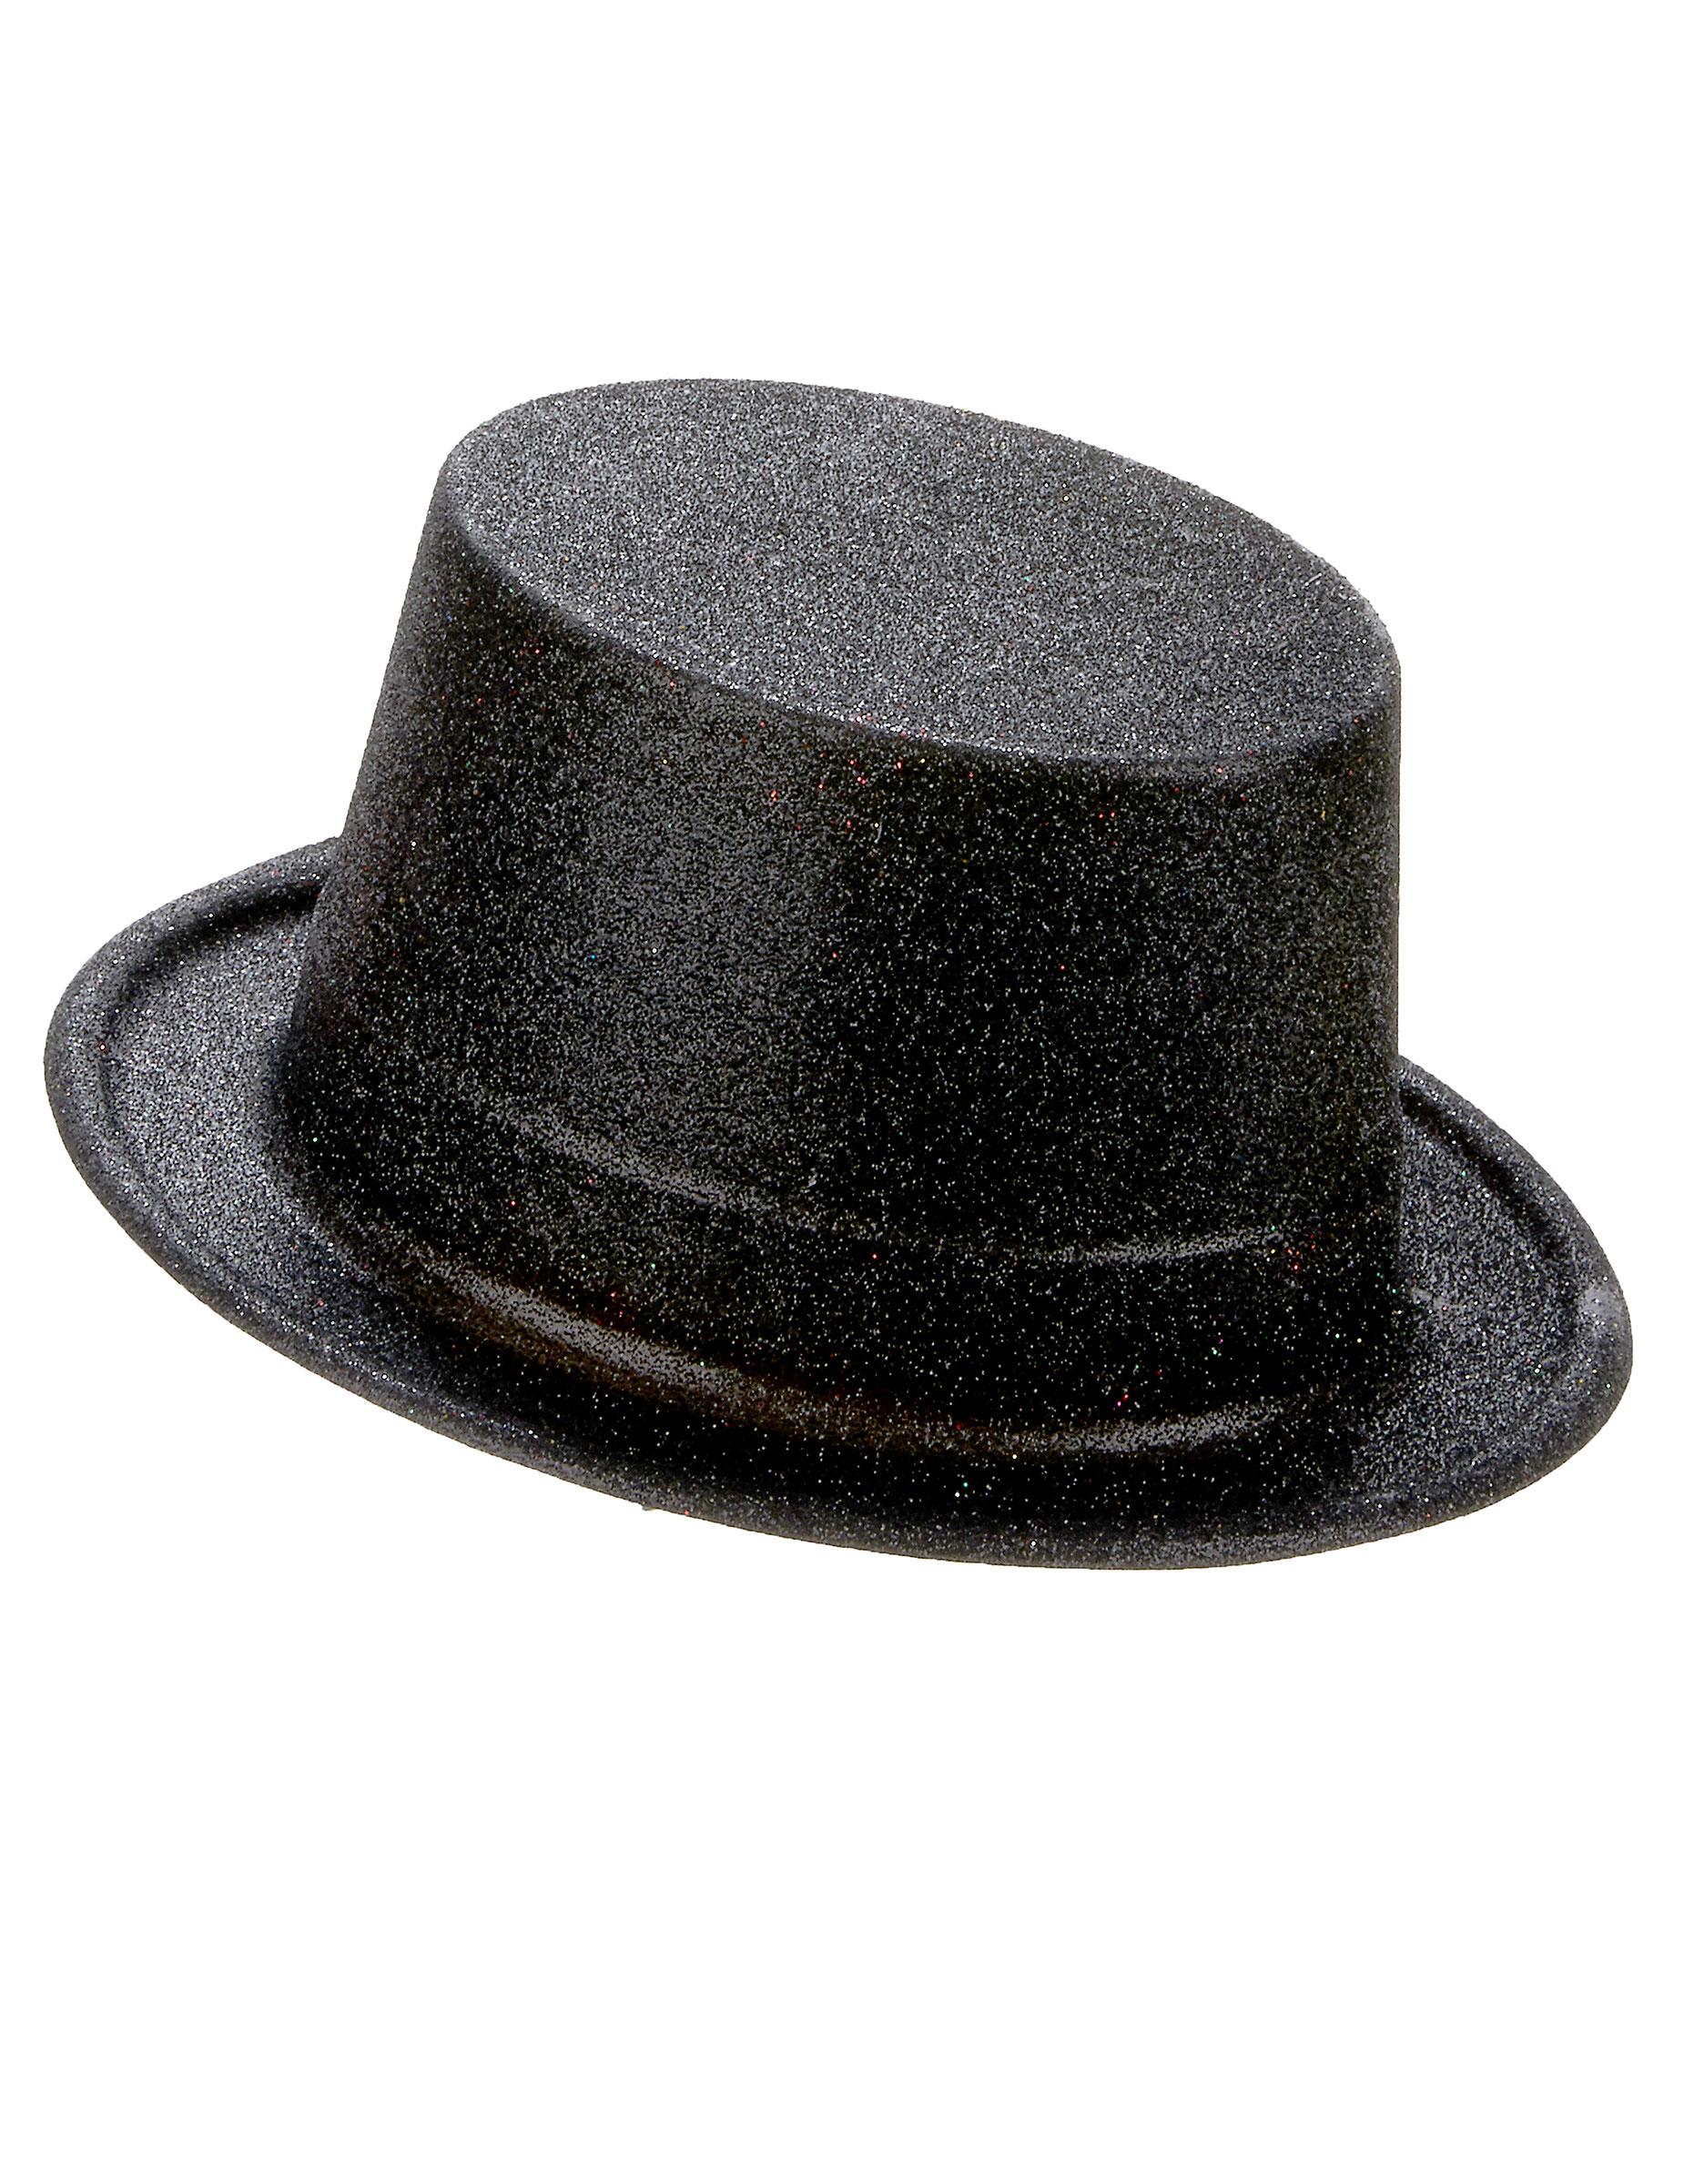 Sombrero de copa de plástico con brillantina negro adulto  Sombreros ... d2a6a2a7502